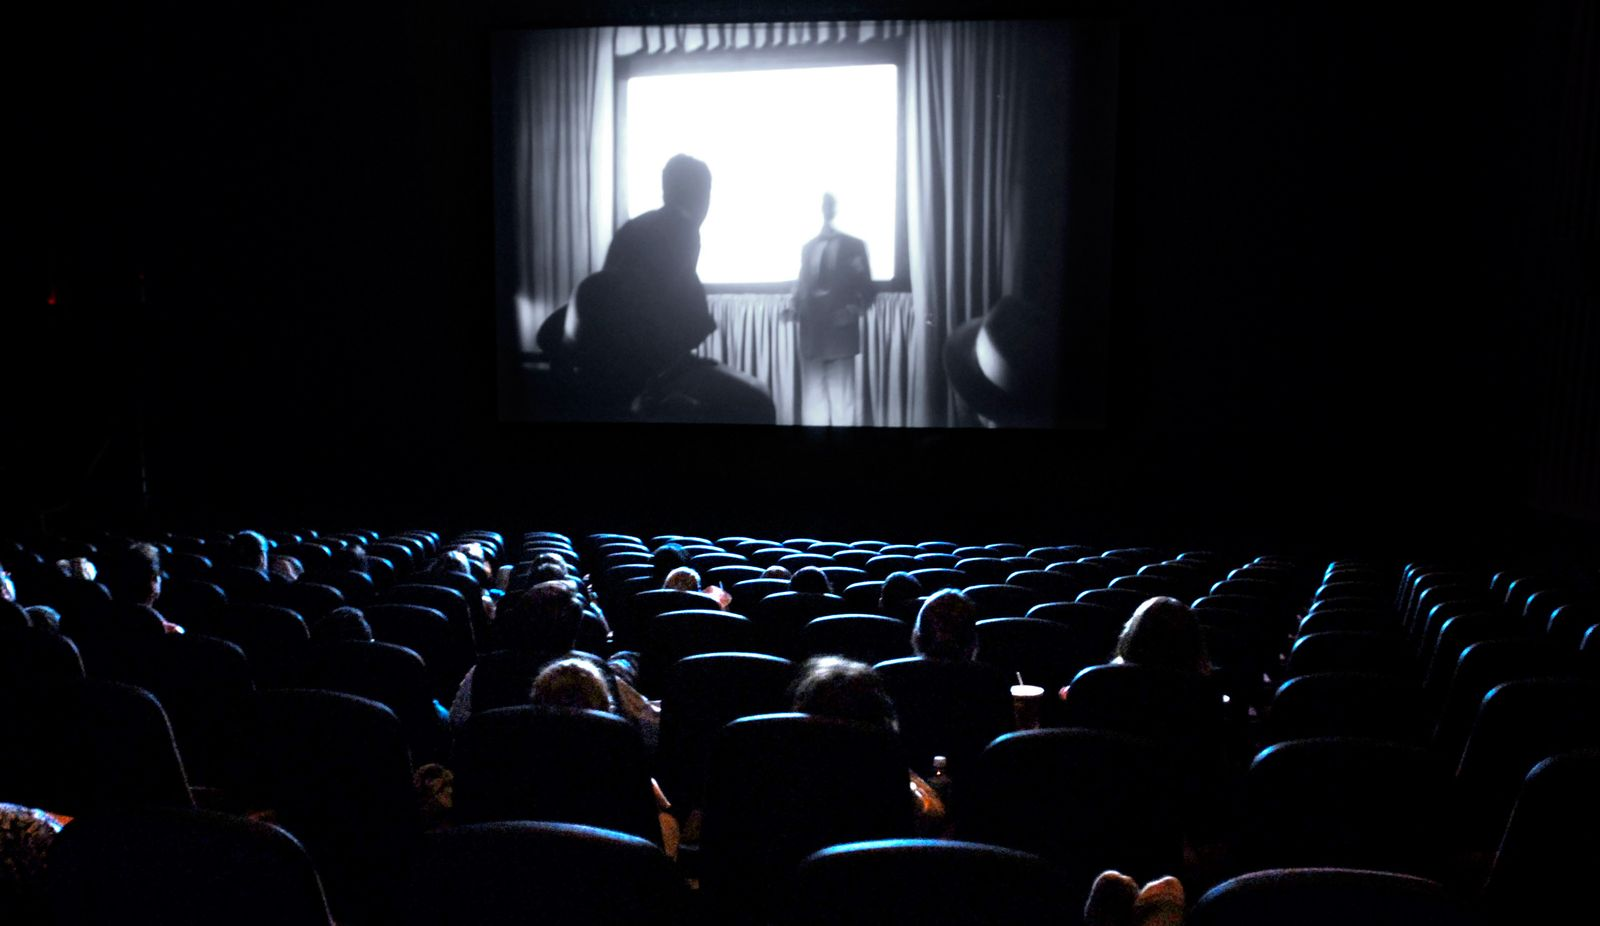 NICHT MEHR VERWENDEN! - Symbolbild/ Kino/ Kinosaal